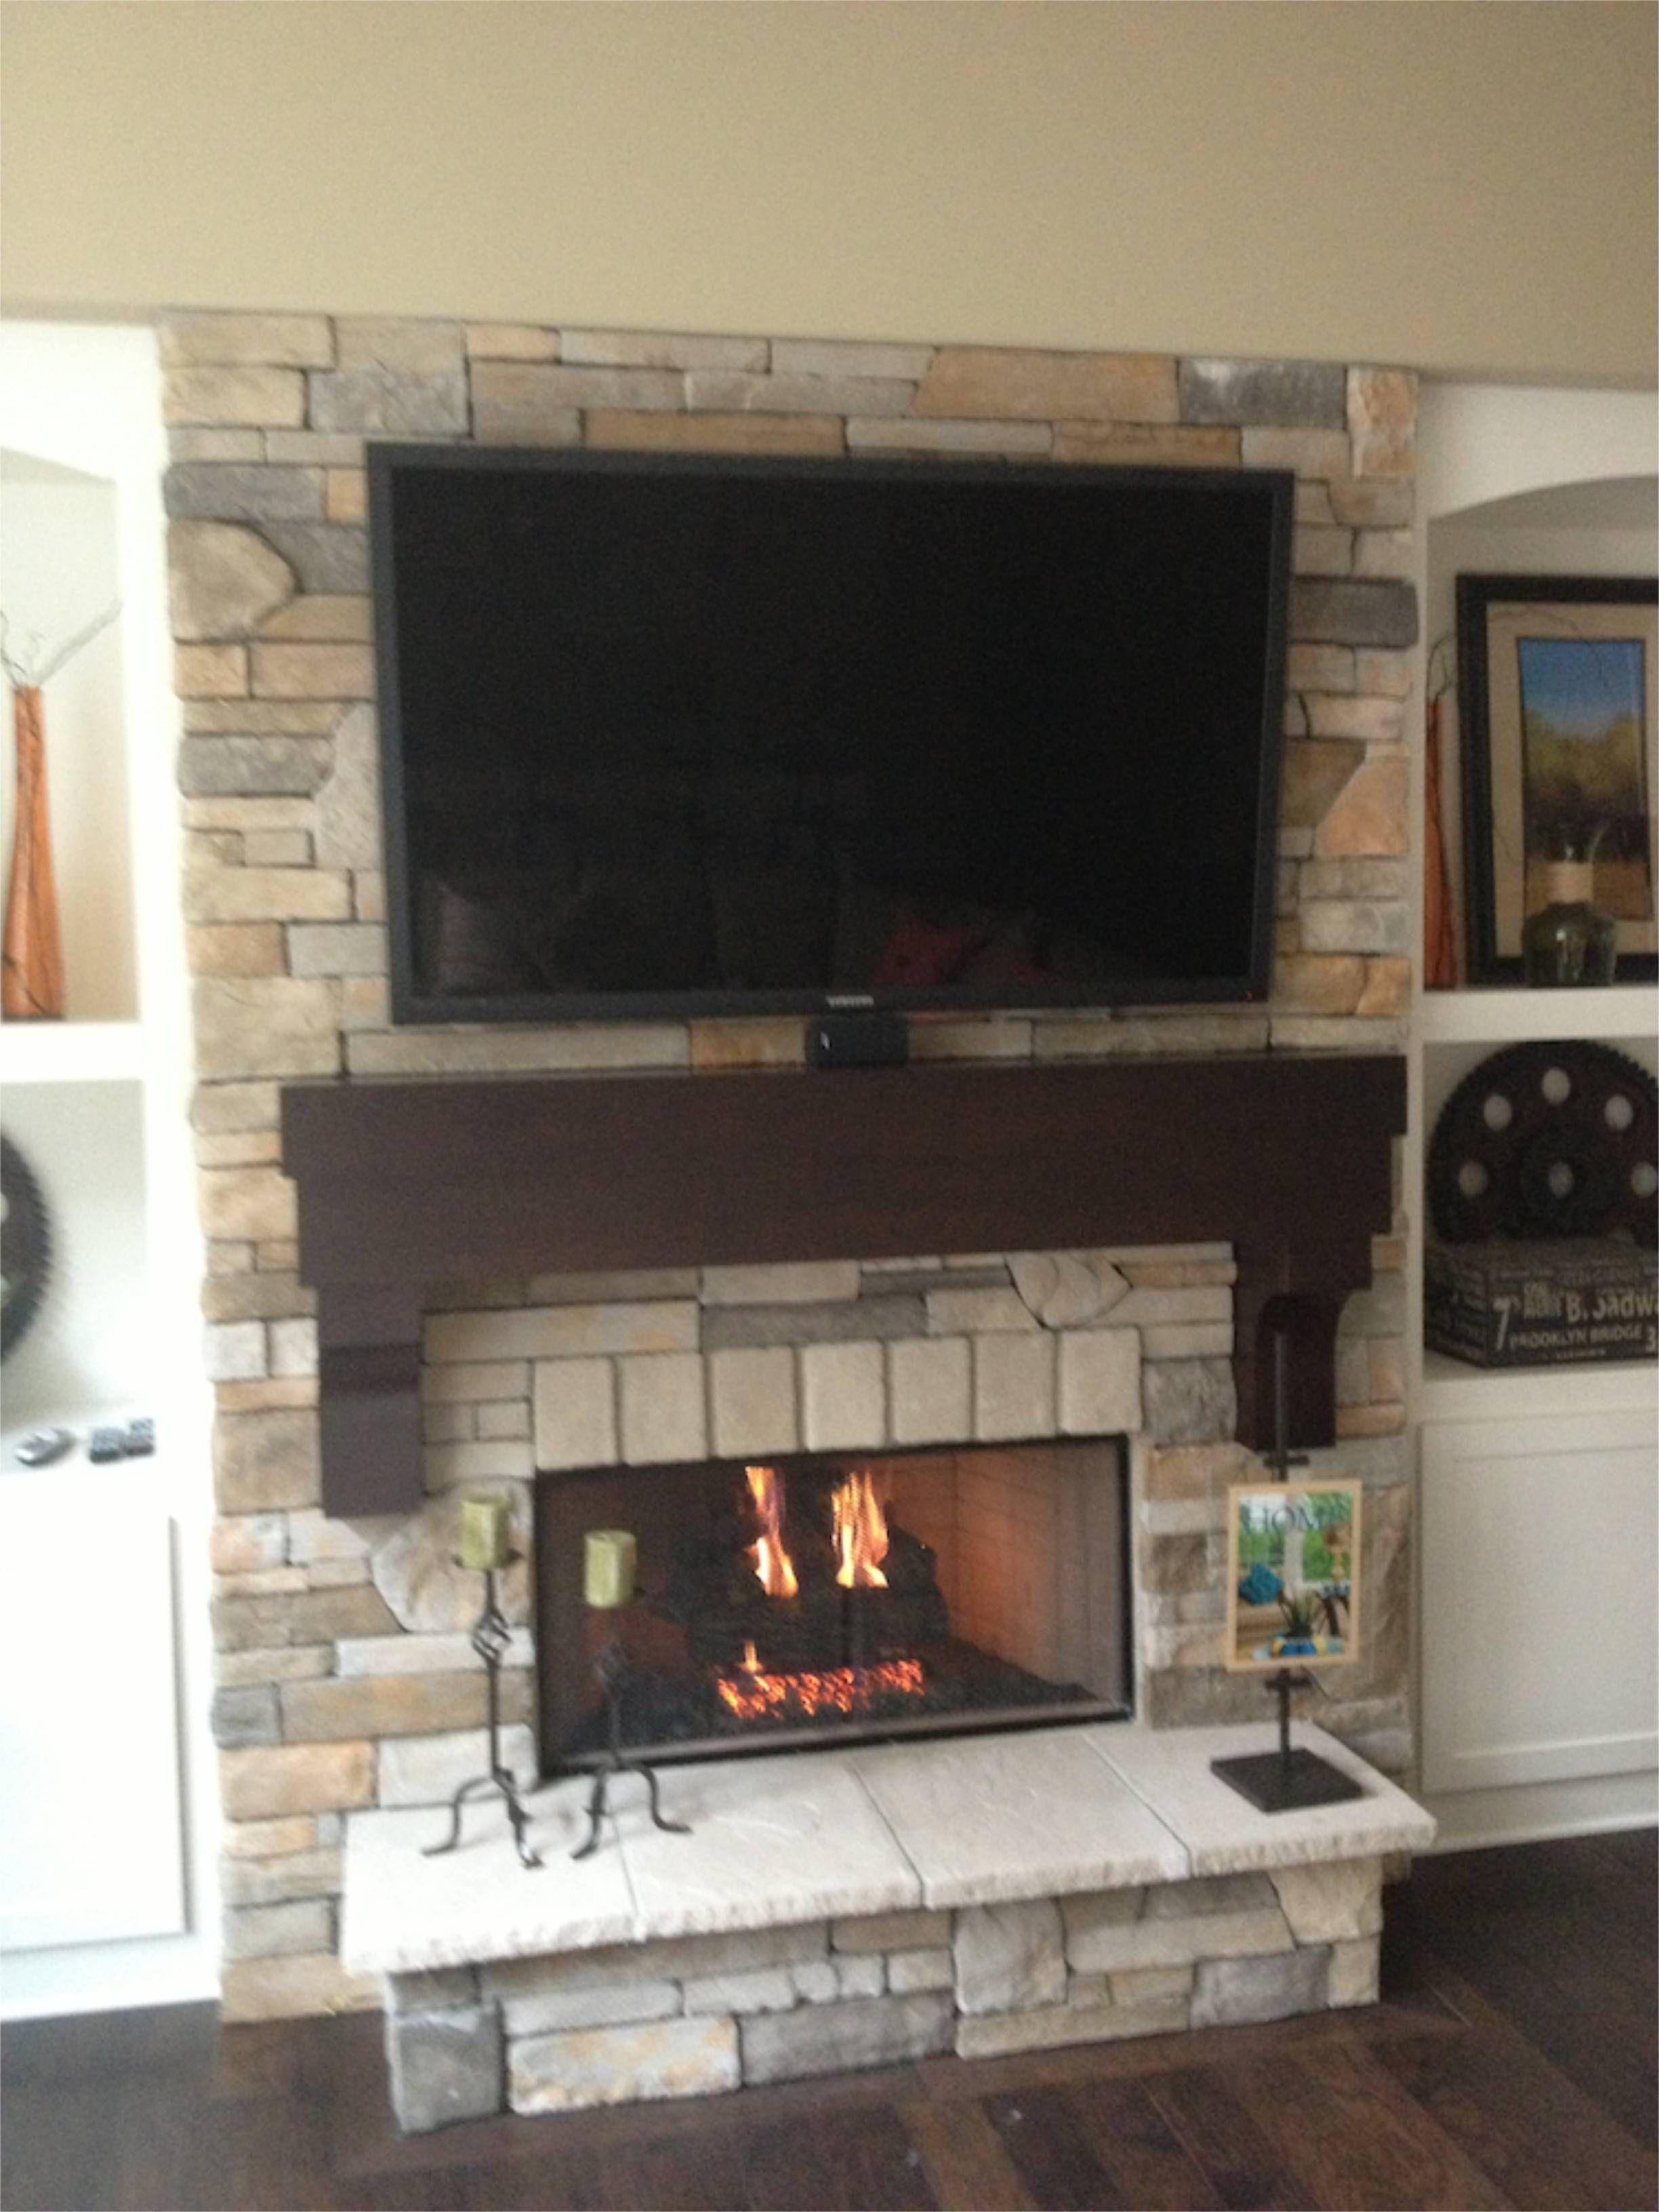 Modern Gas Fireplace Inserts Burlington ... | Fireplace inserts, Gas fireplace logs, Corner gas ...